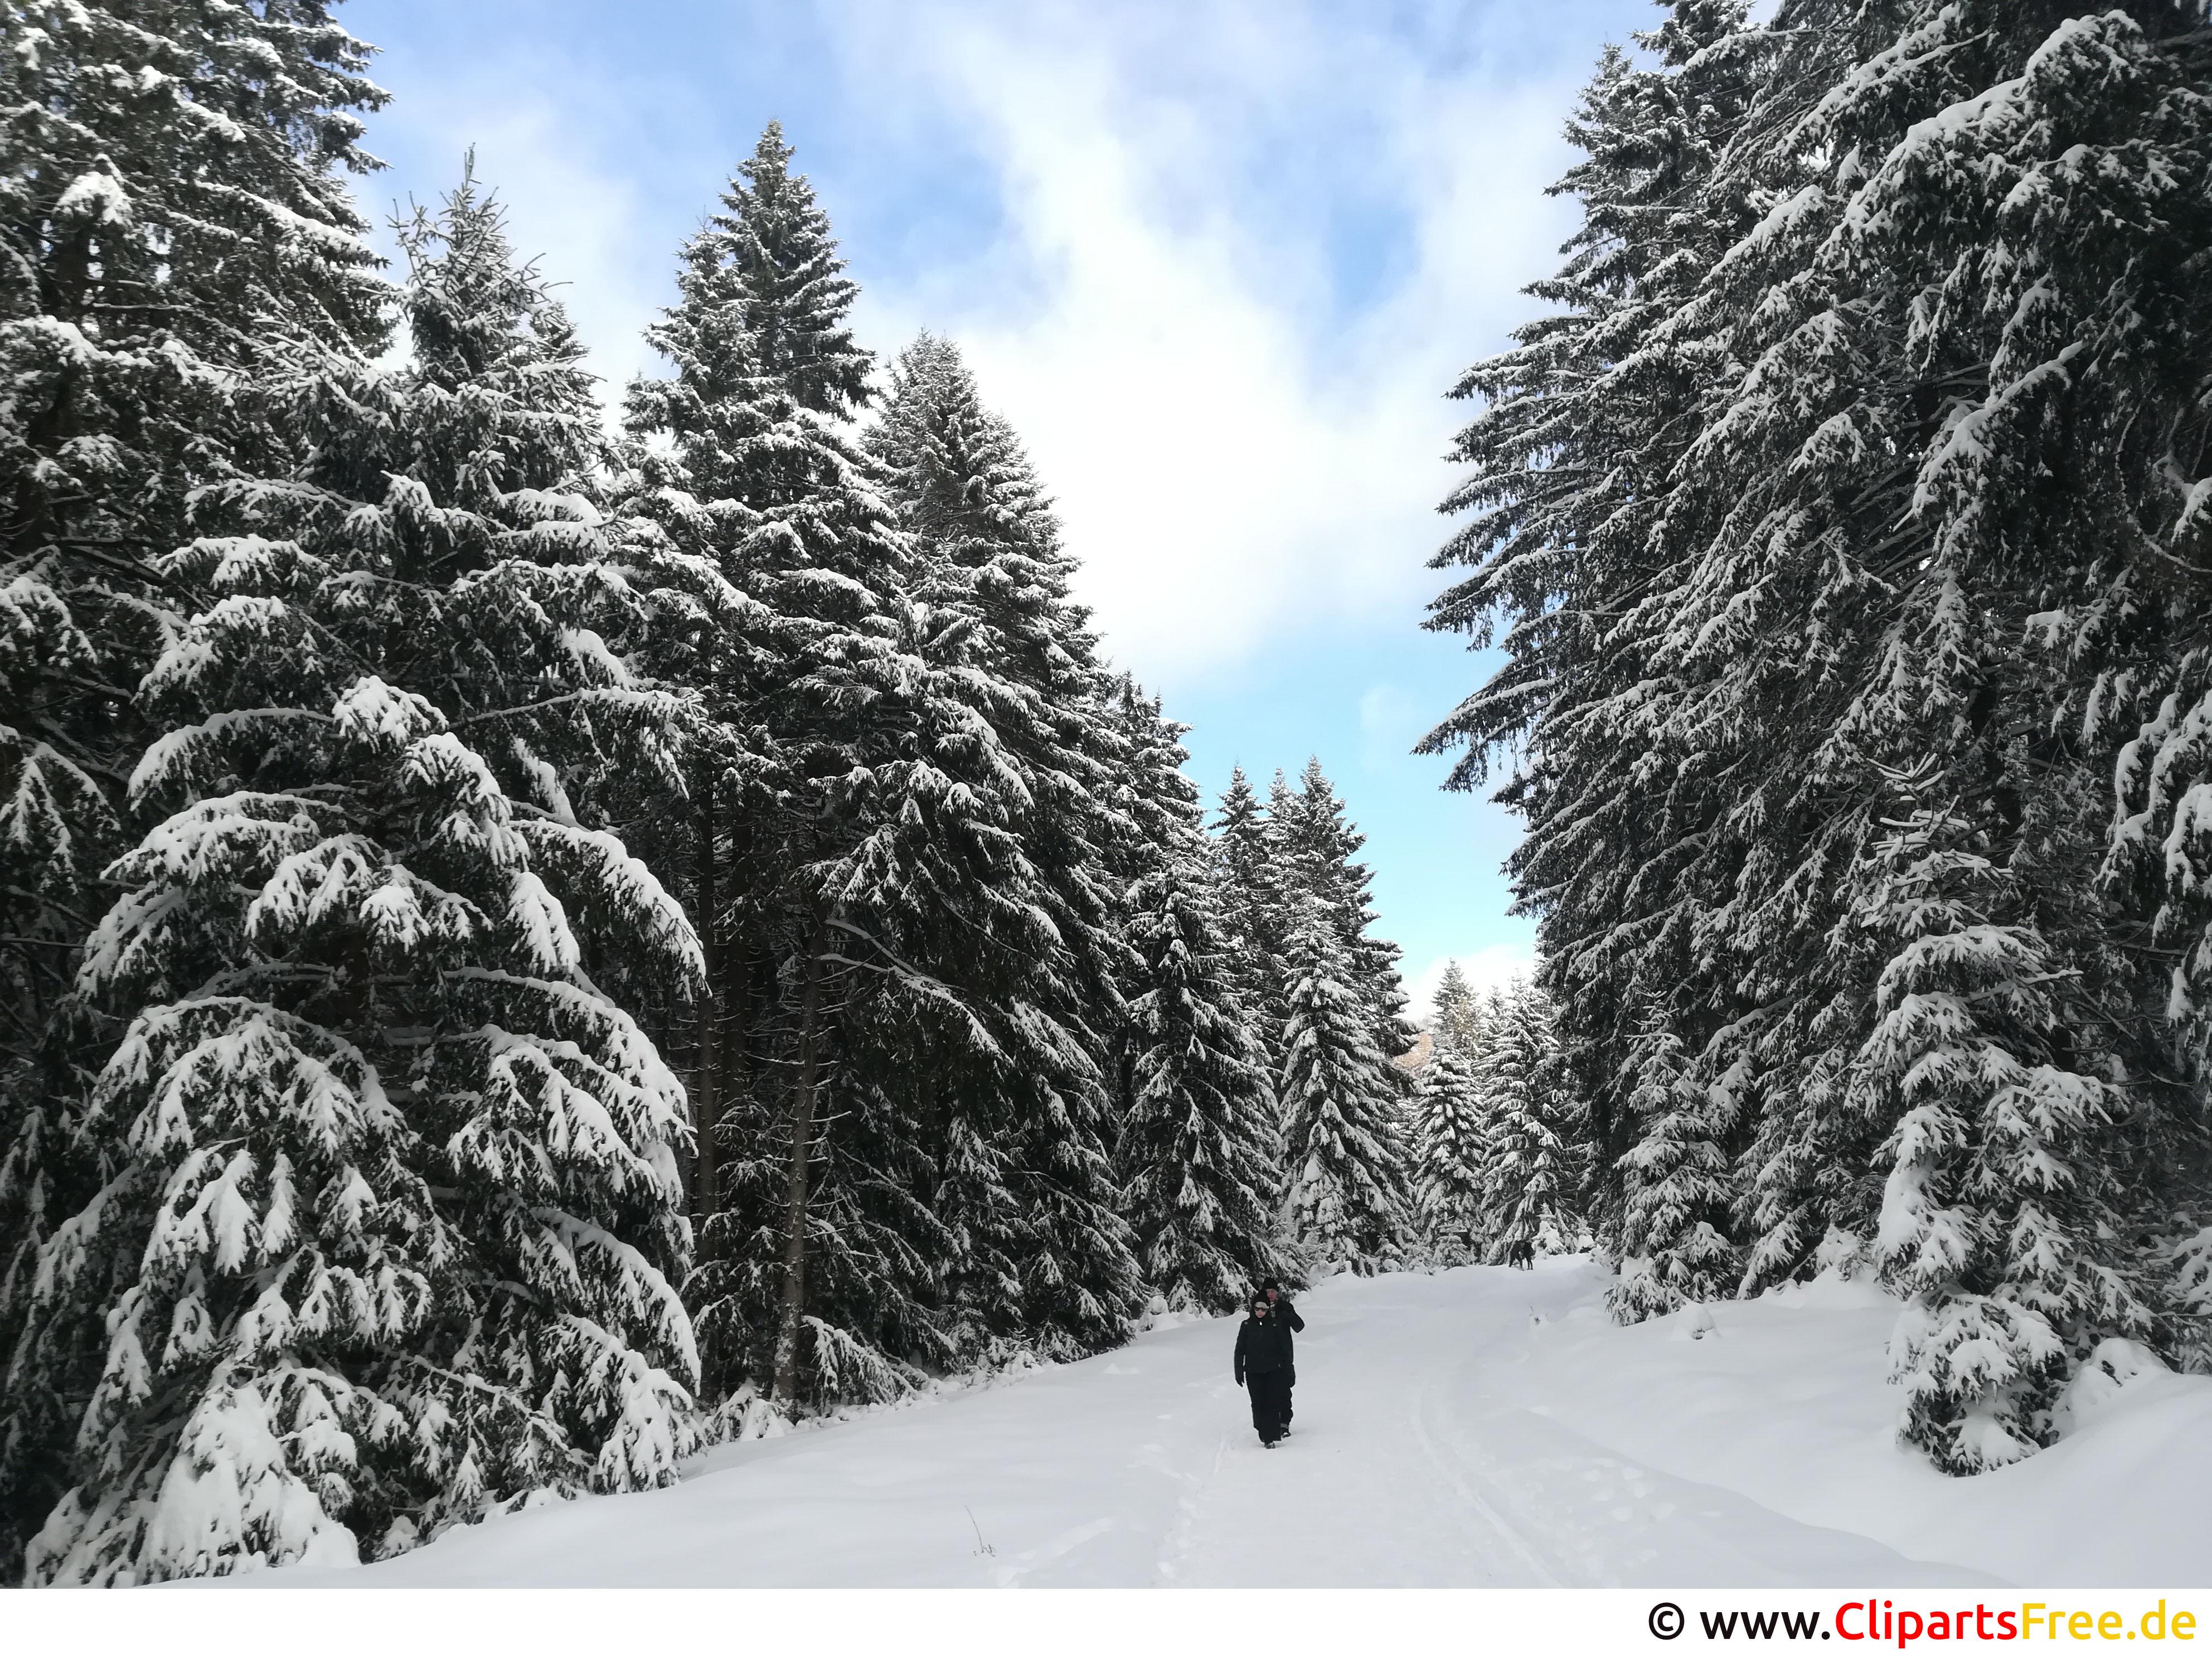 Wandern im Wald im Winter Bild, Foto, Grafik kostenlos